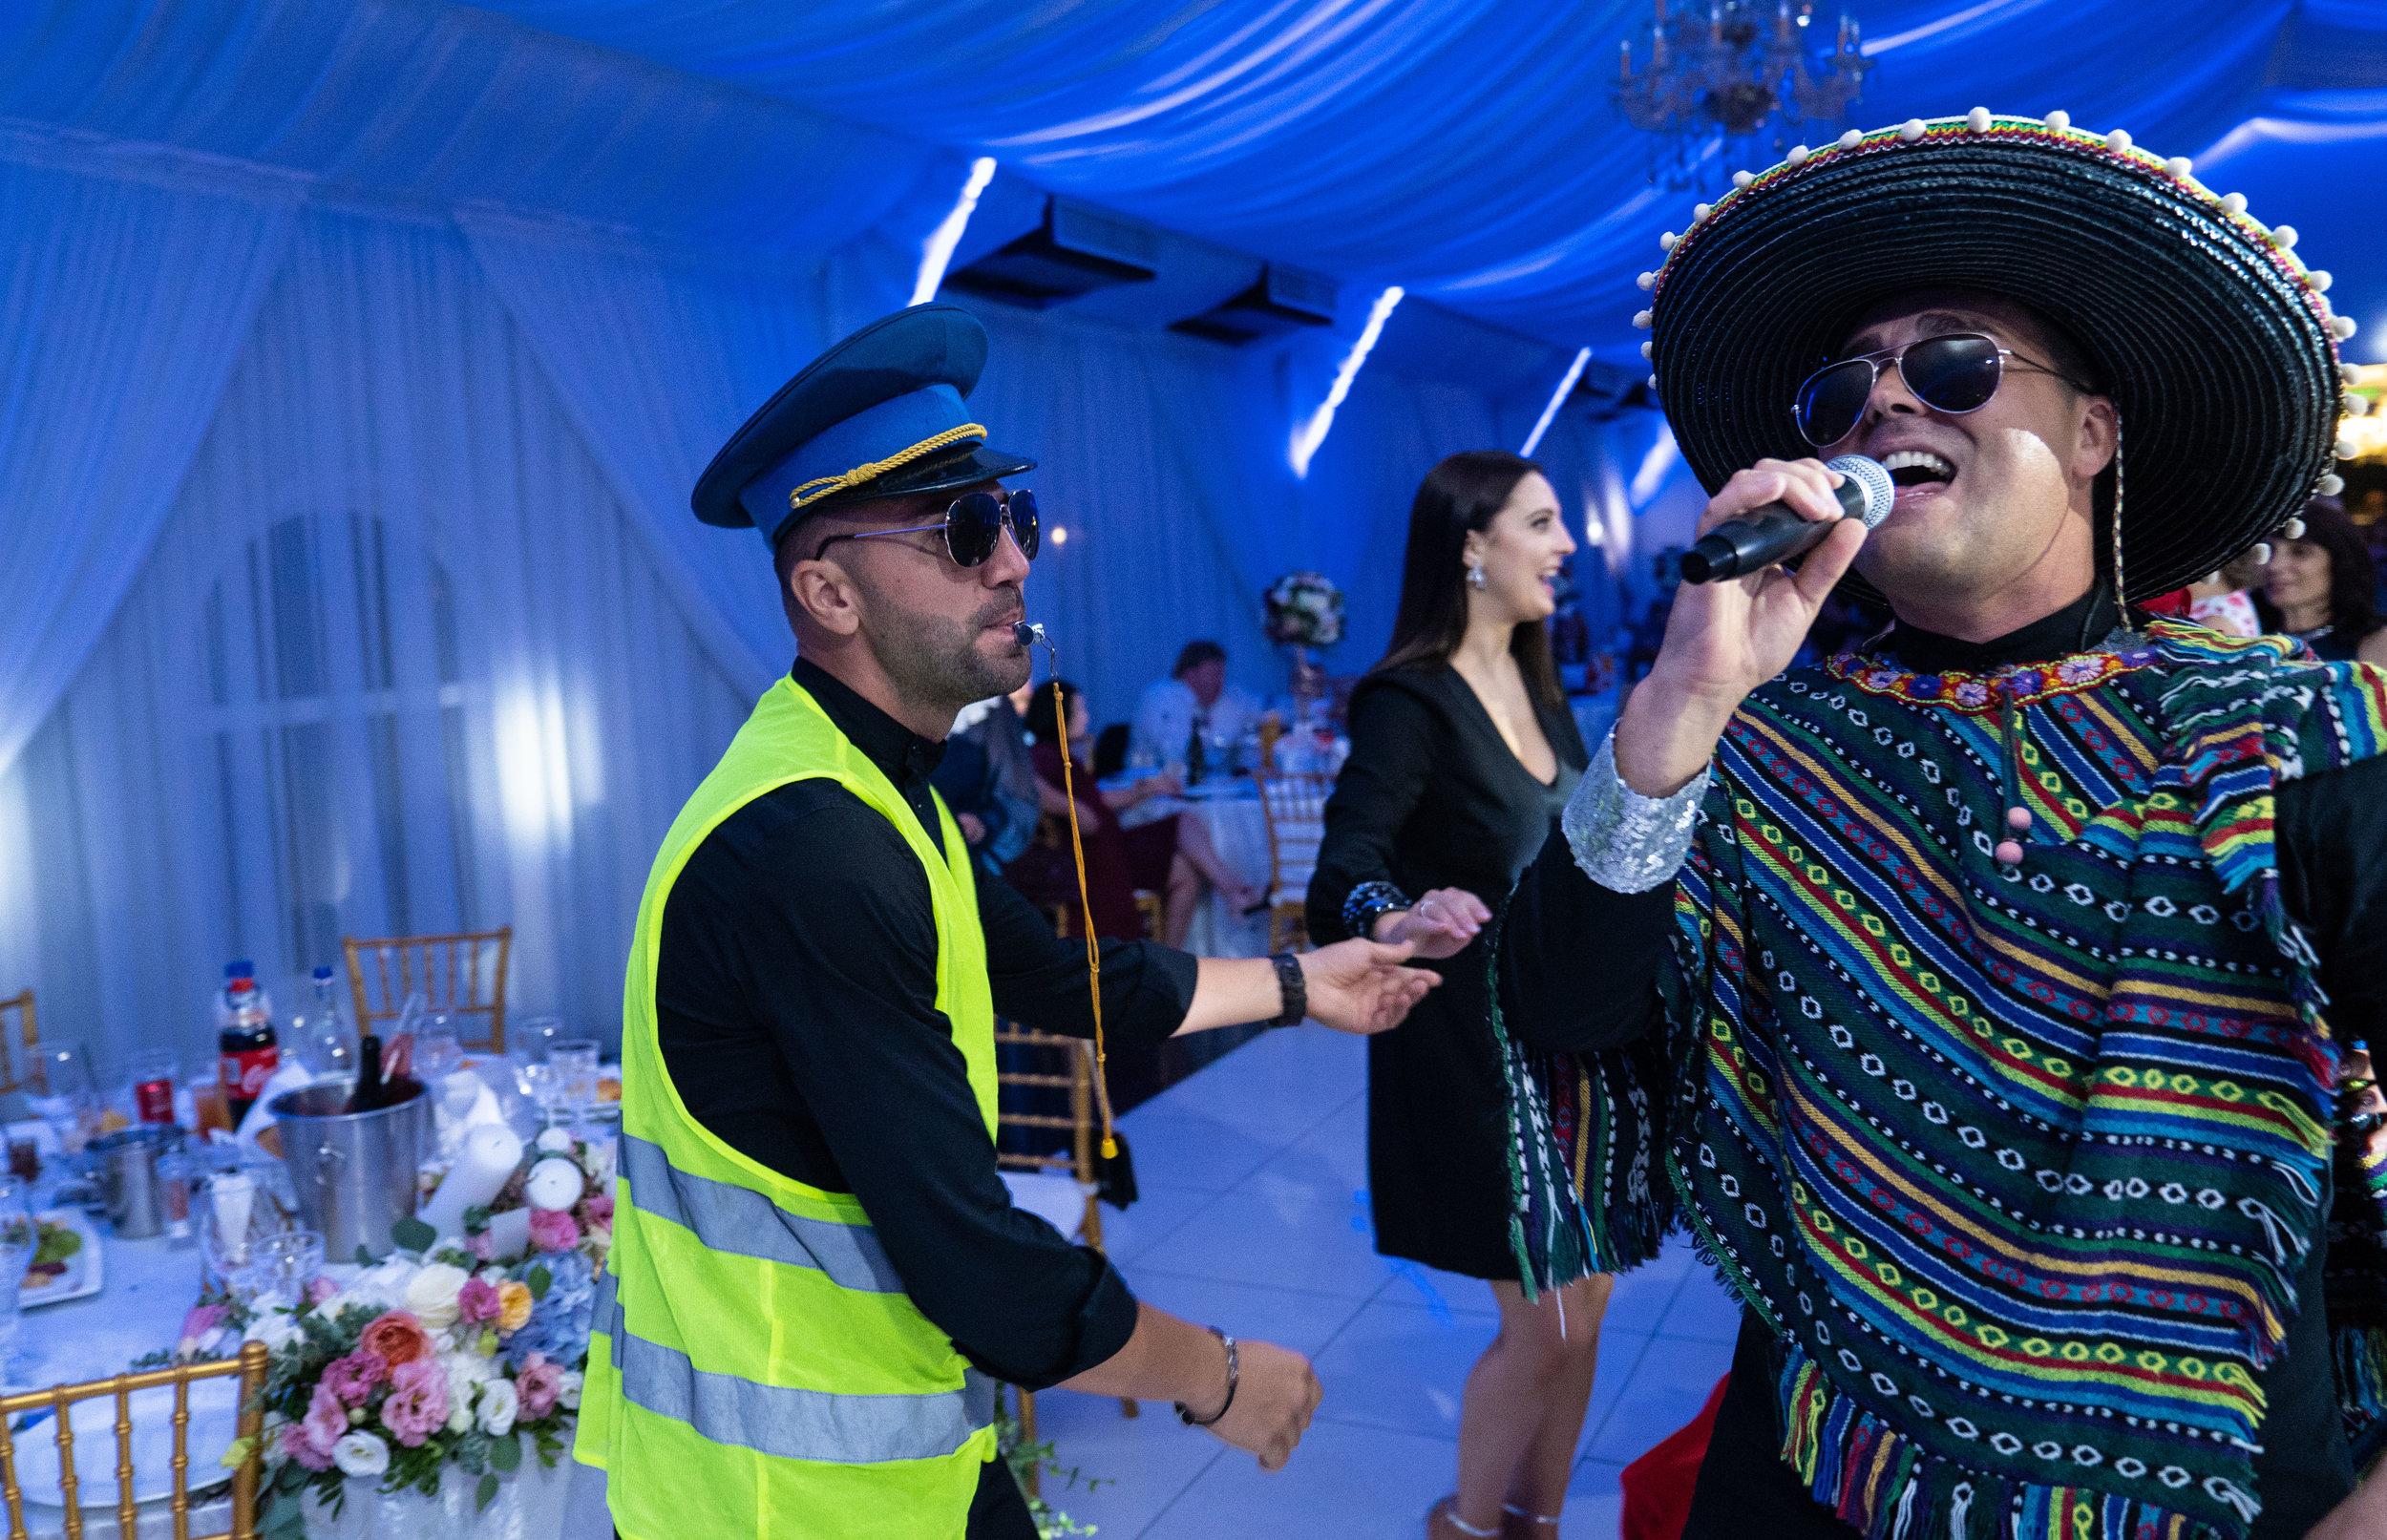 london-romania-destination-wedding-photographer-videographer-131